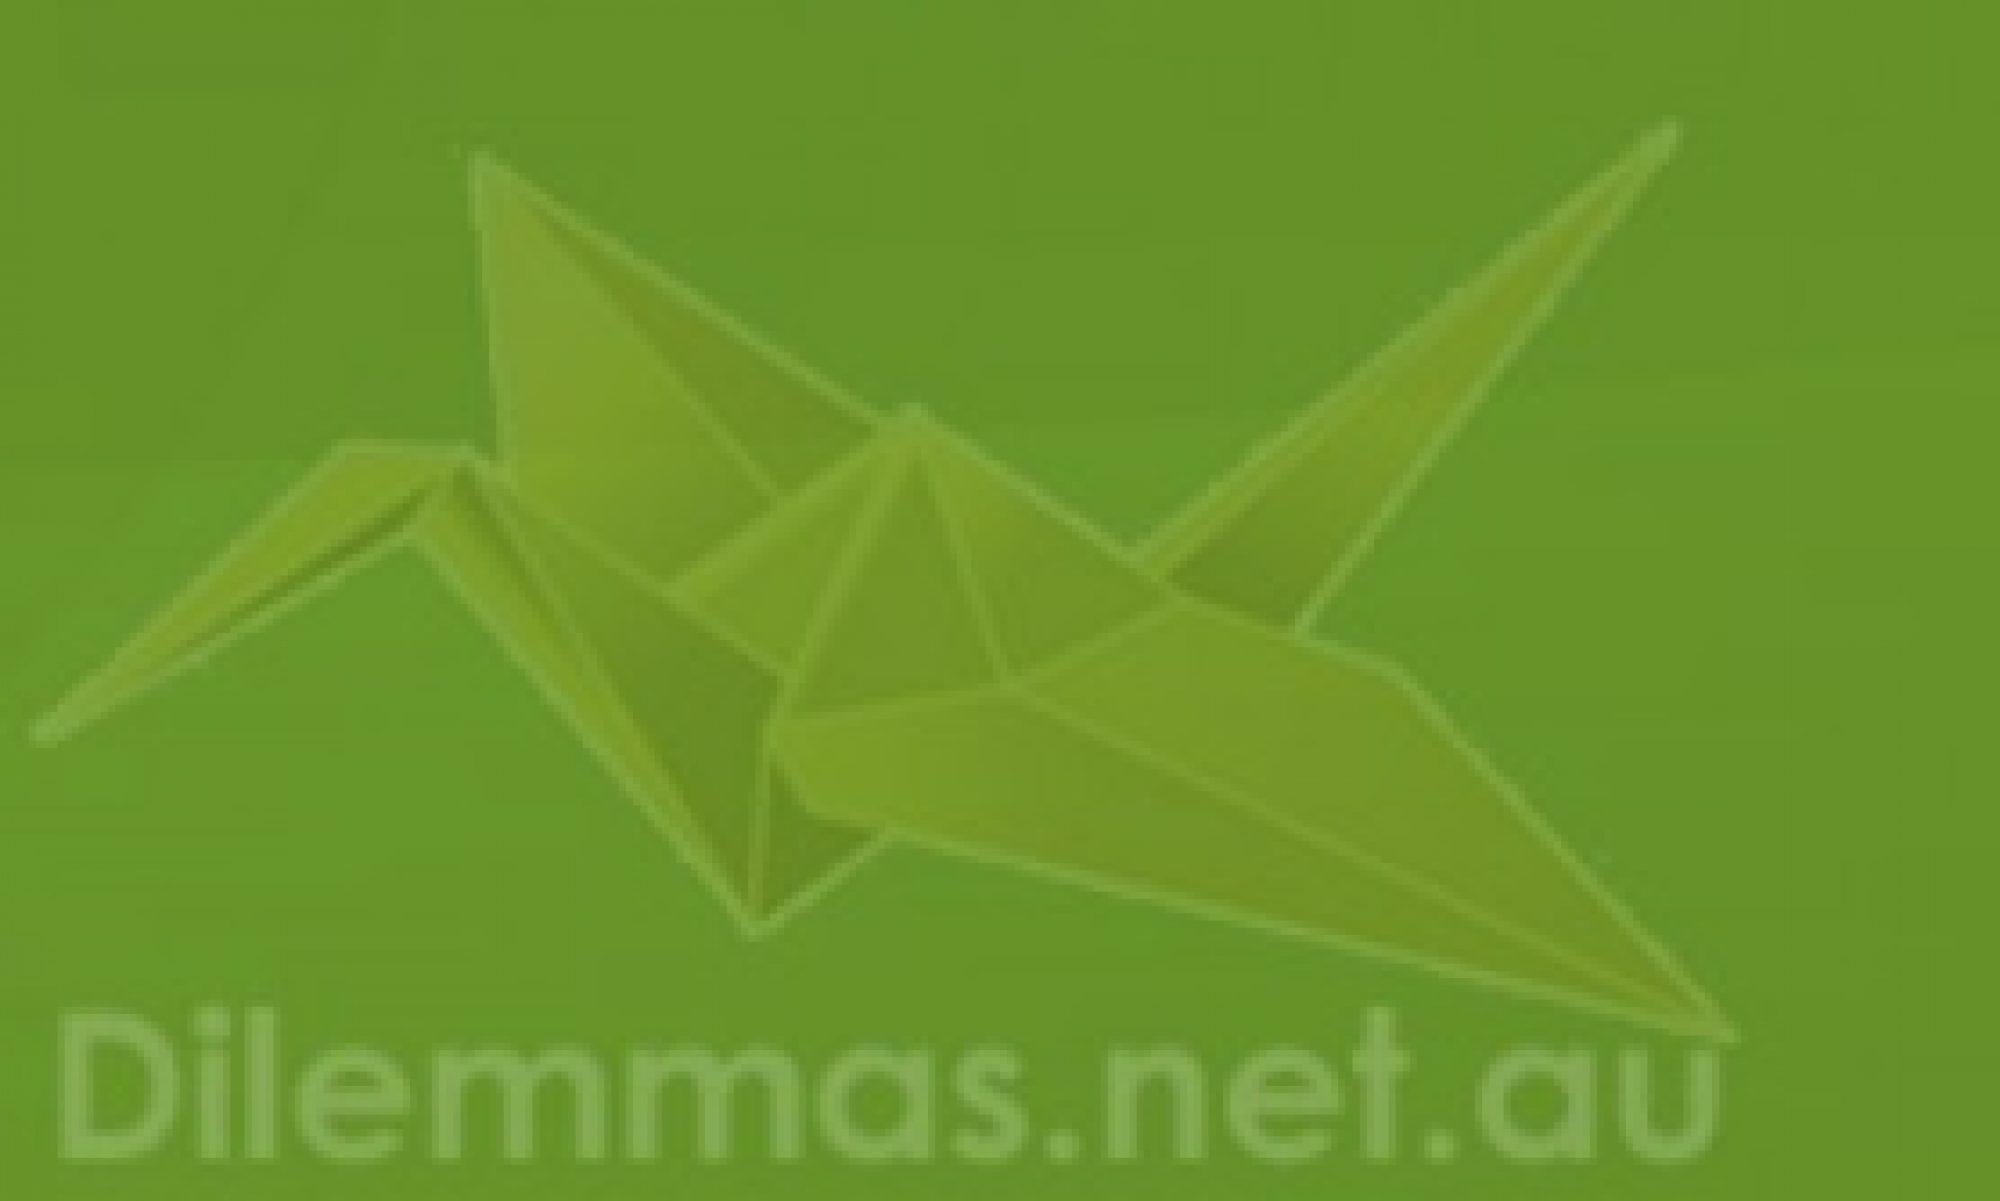 Dilemmas.net.au